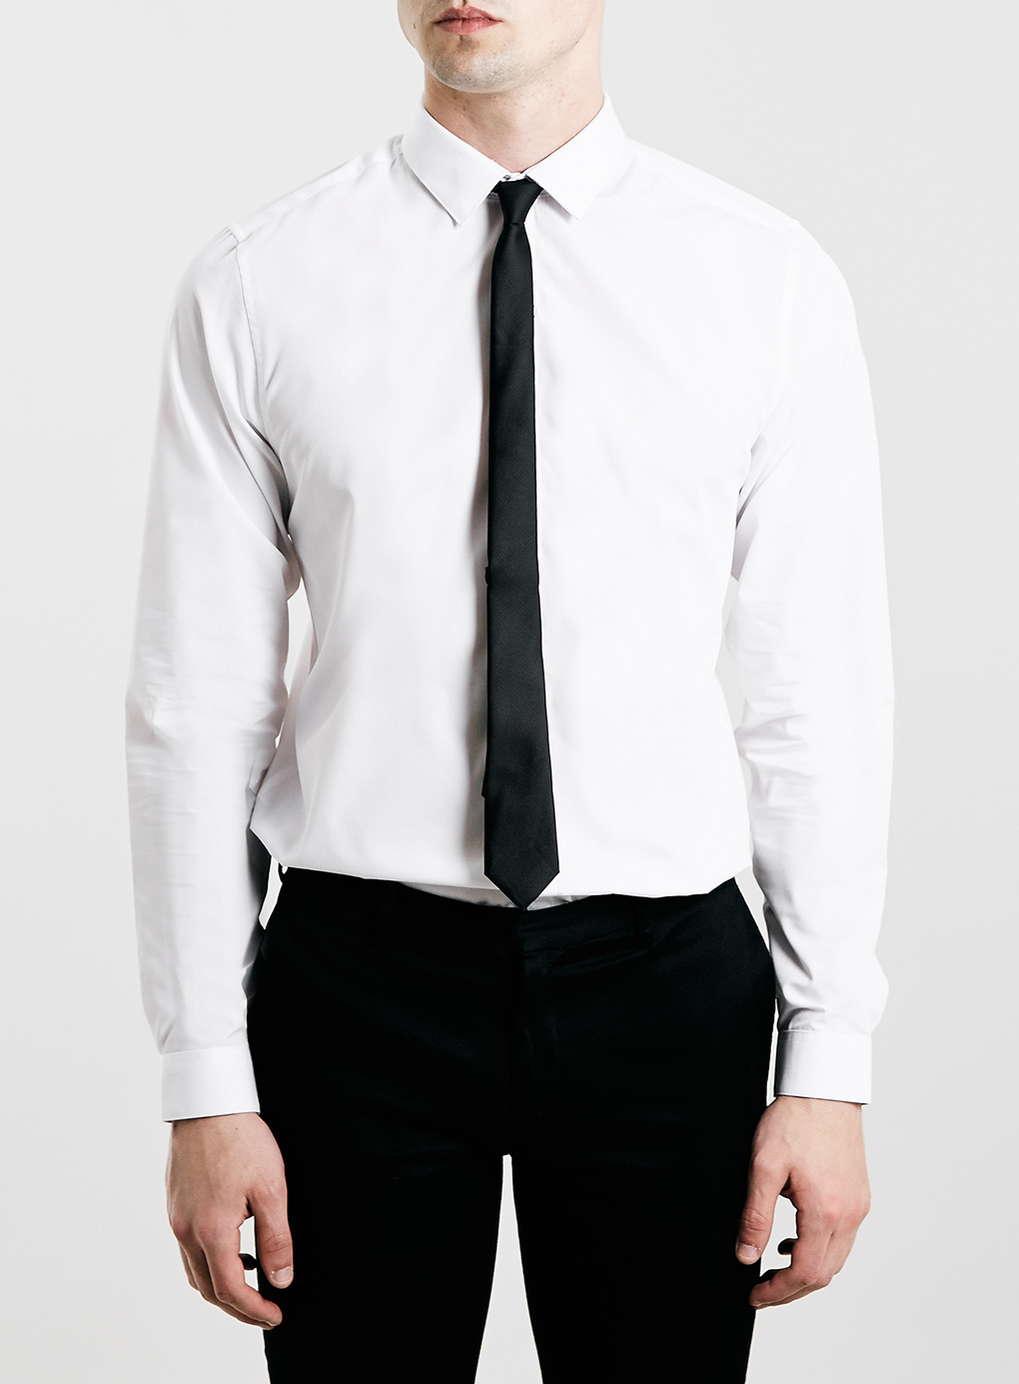 Topman white shirt black tie pack in white for men lyst for White shirt with black